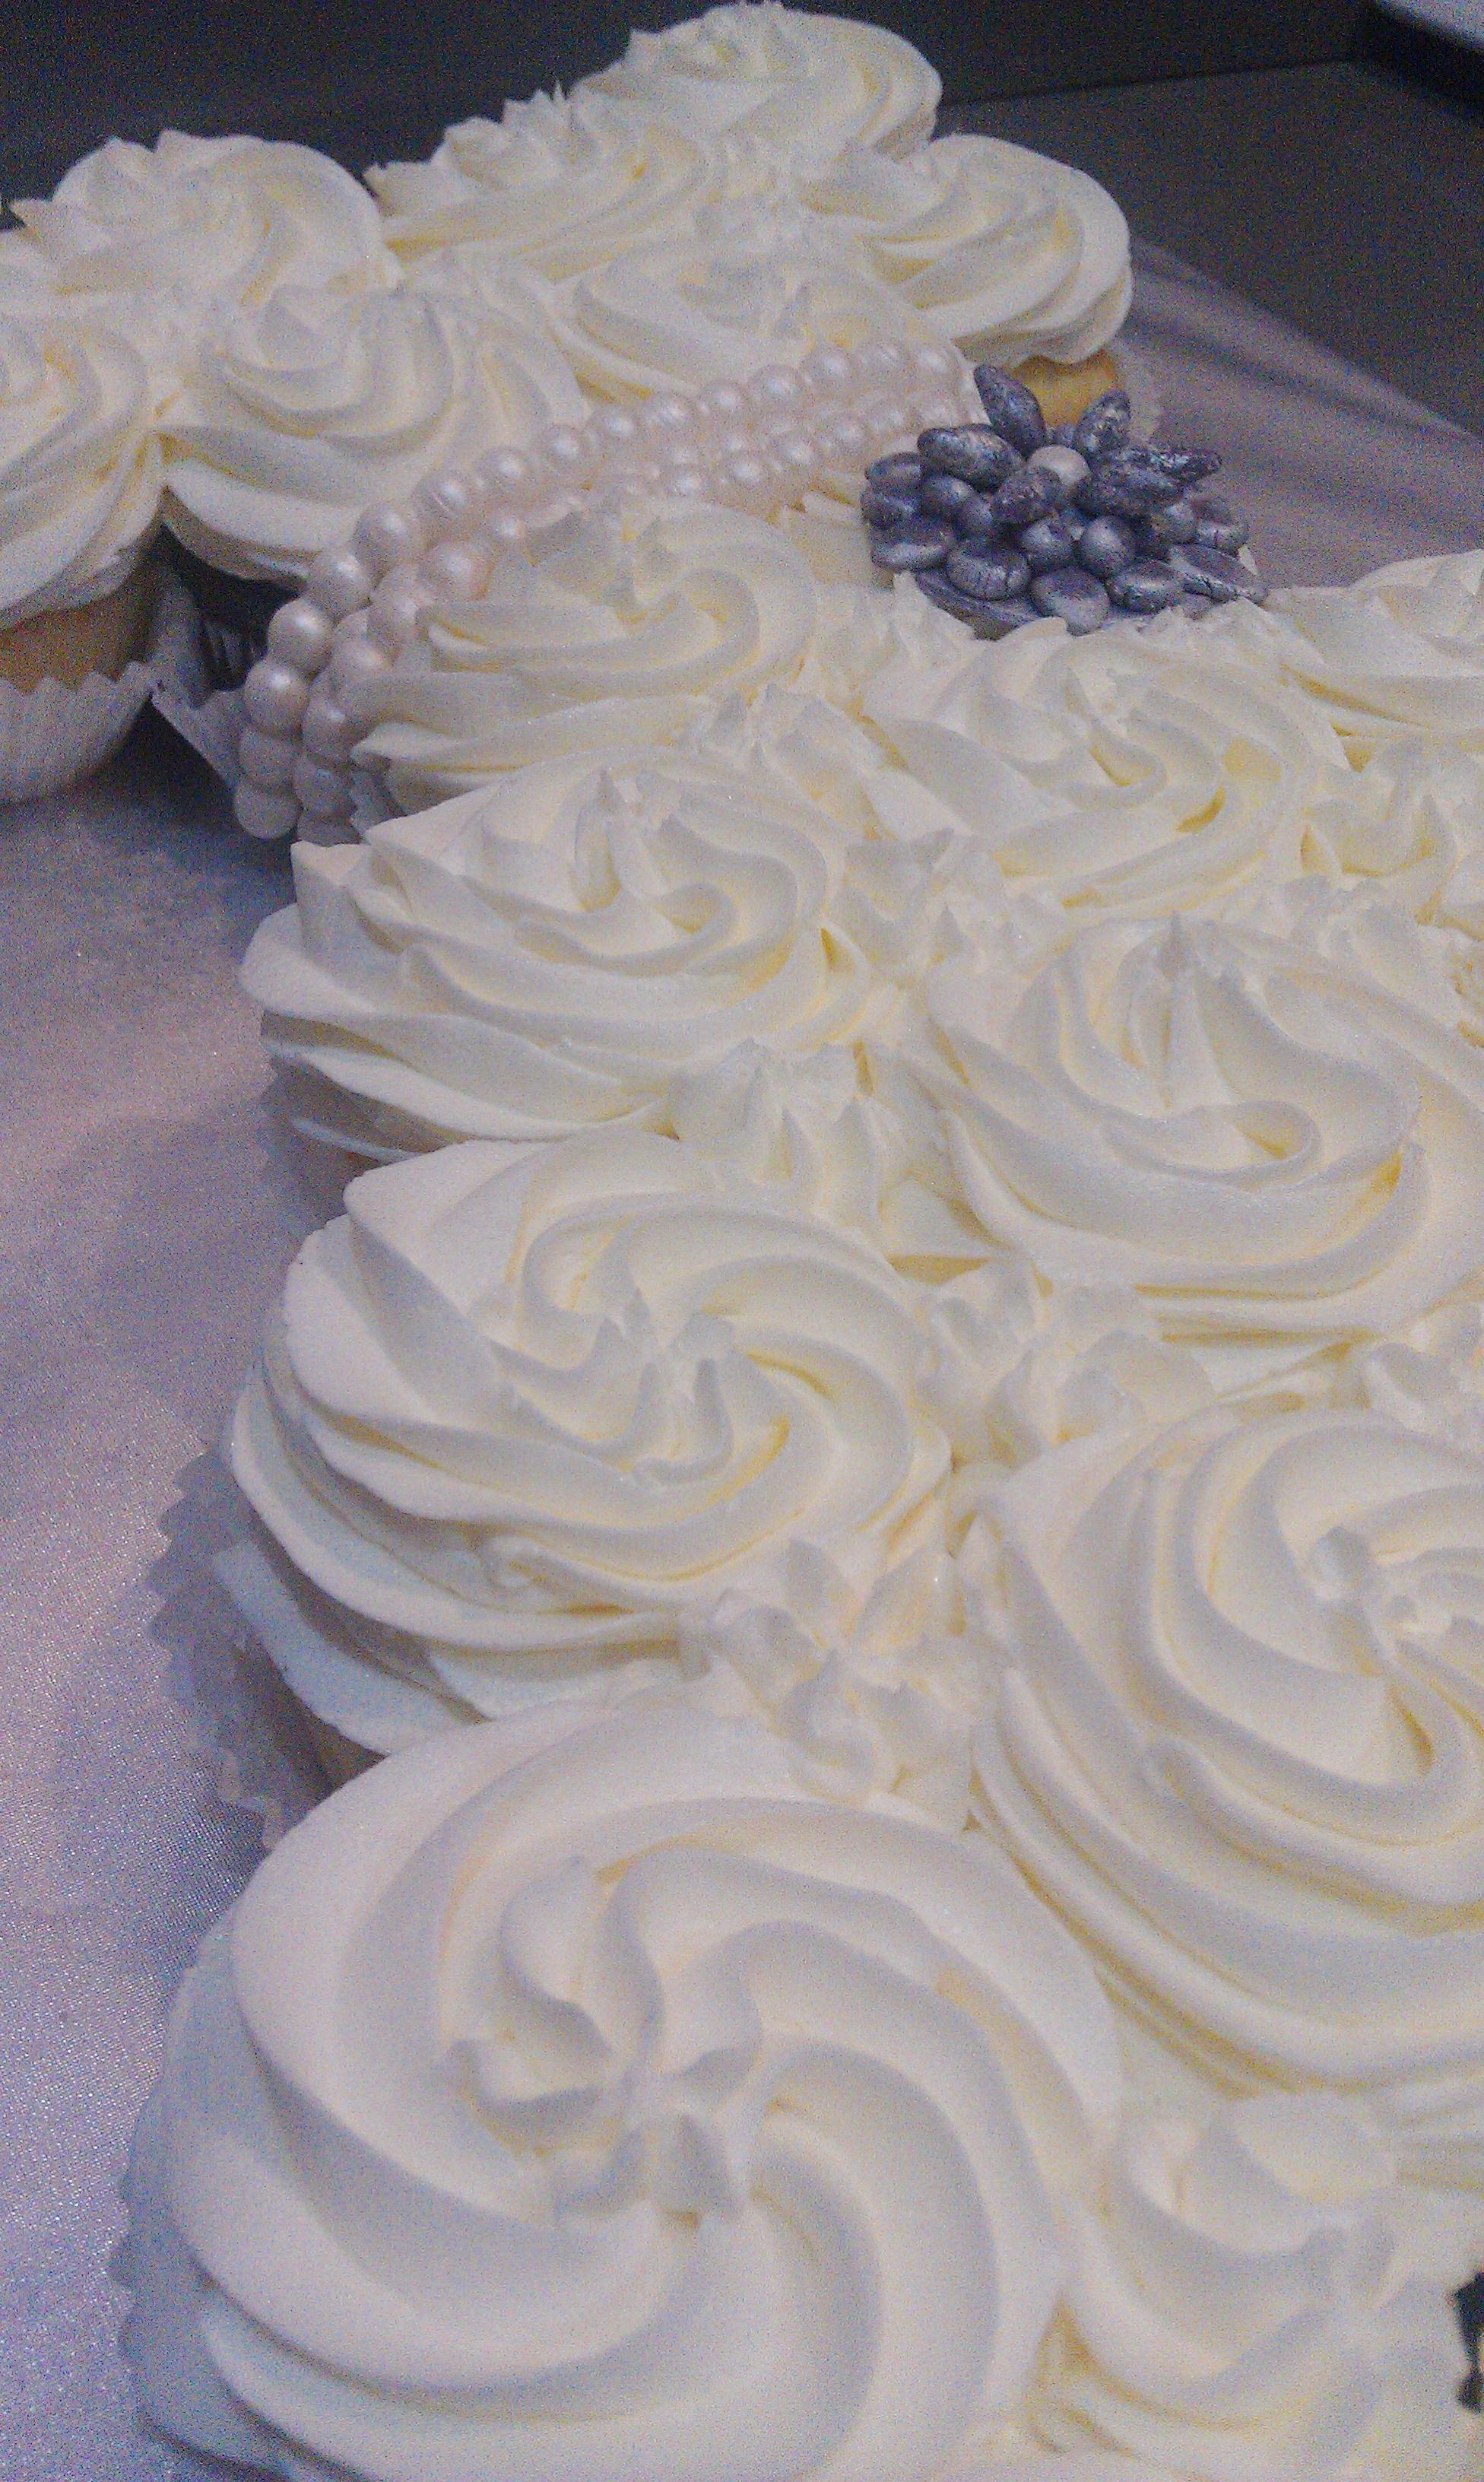 Sugarfuse Cupcakery Cake Studio bridal shower bride